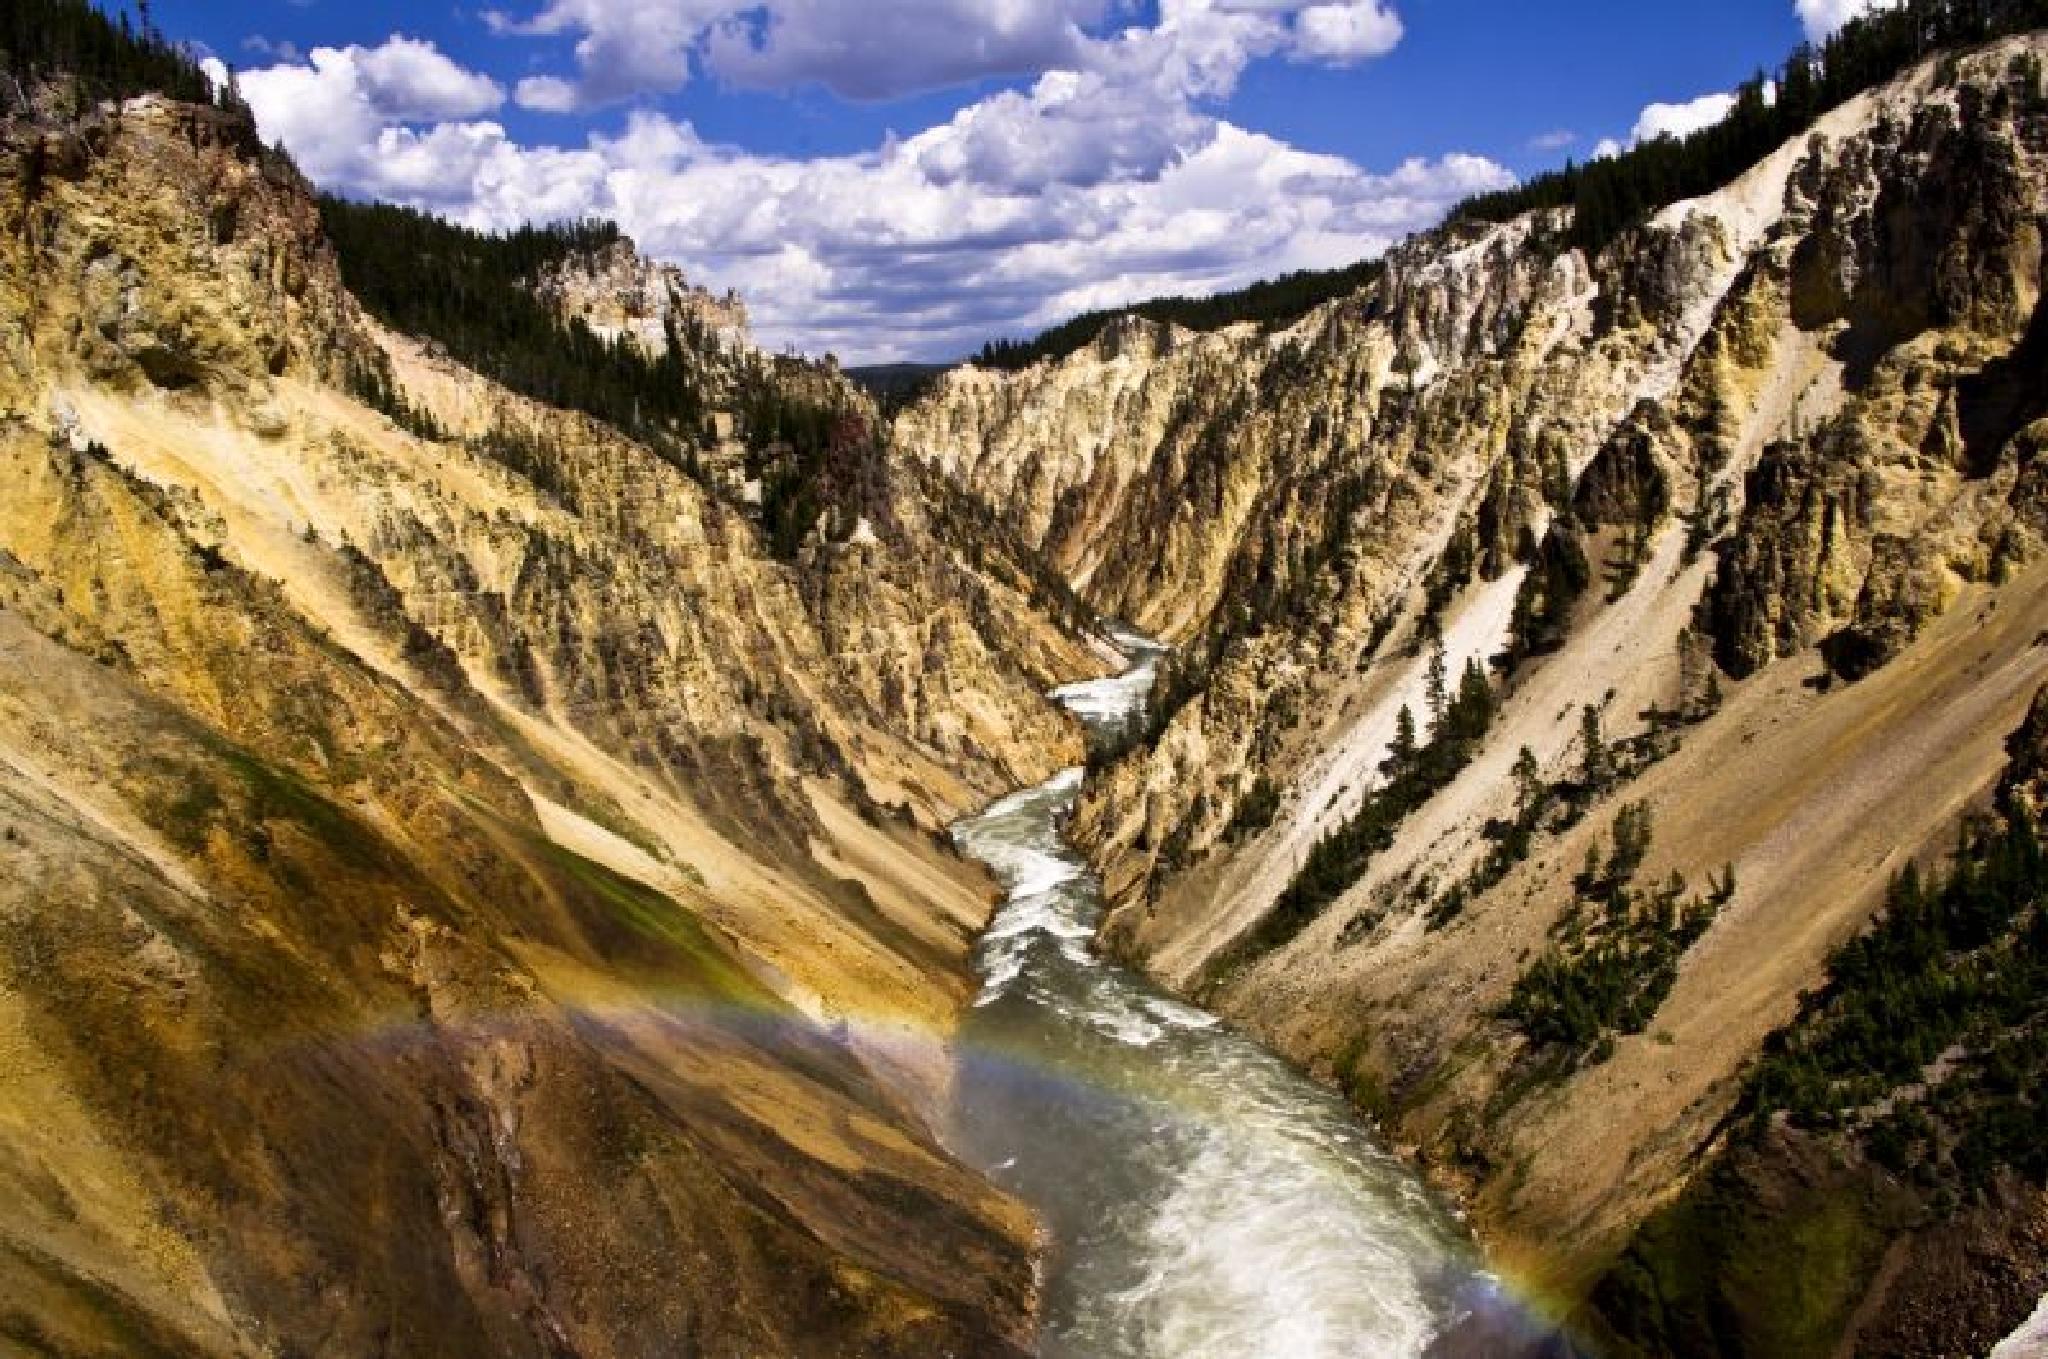 Yellowstone canyon by Zdenko Somorovsky